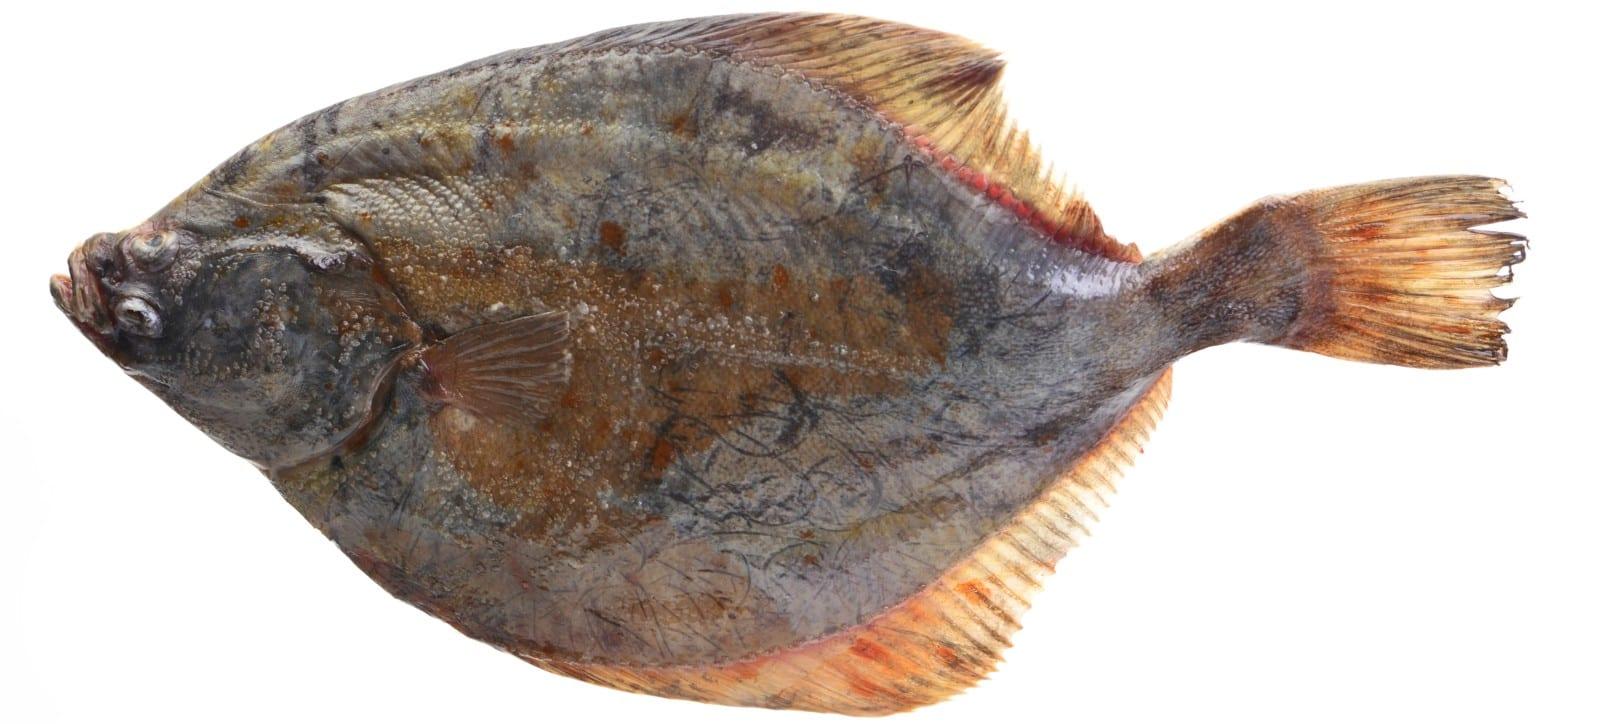 Profile image of a halibut